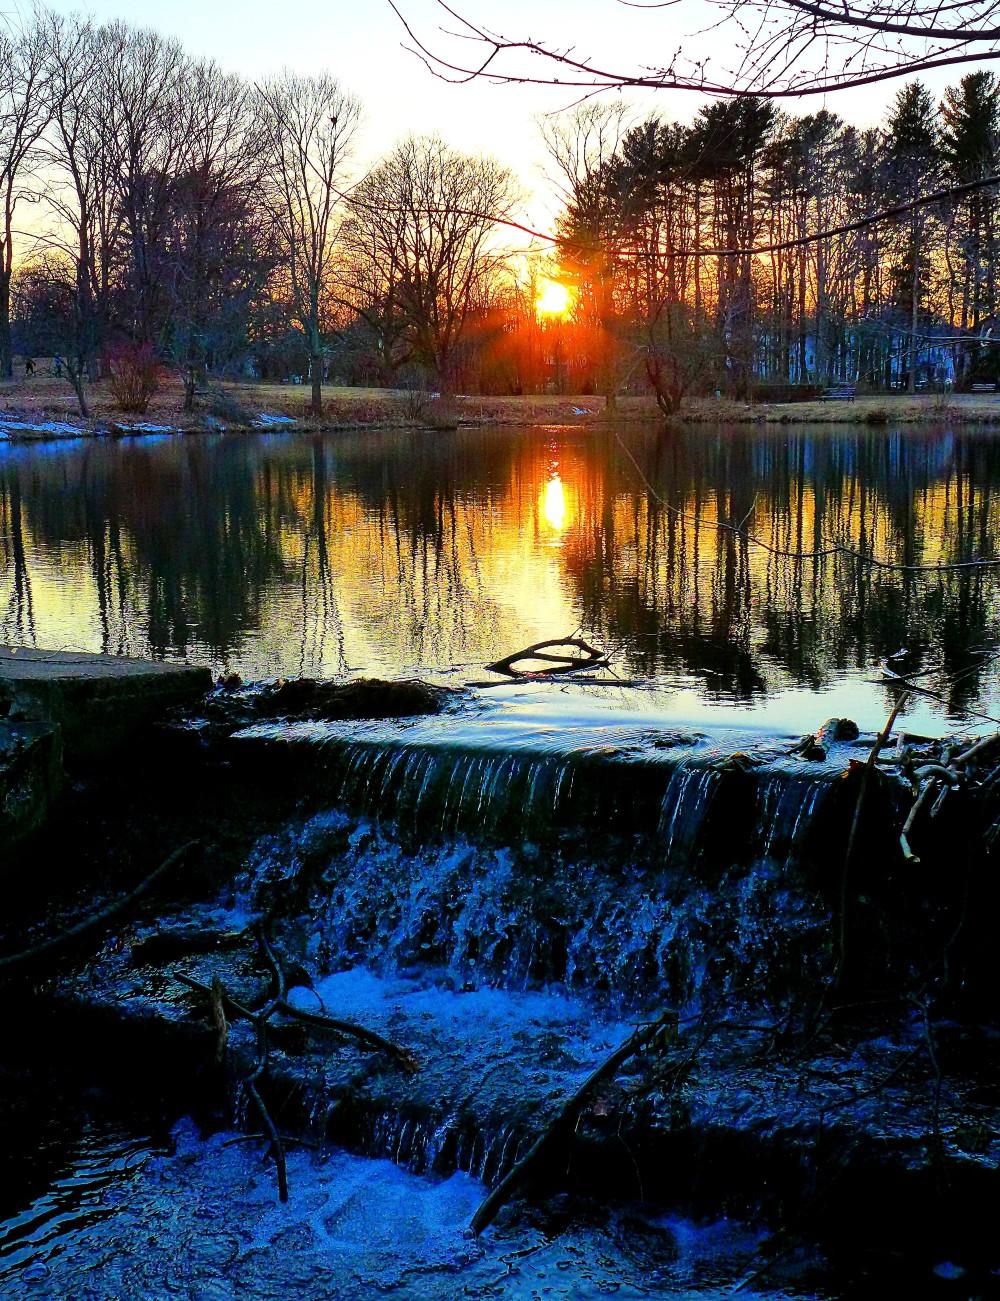 Willow Pond at Bird Park, Walpole, Mass.